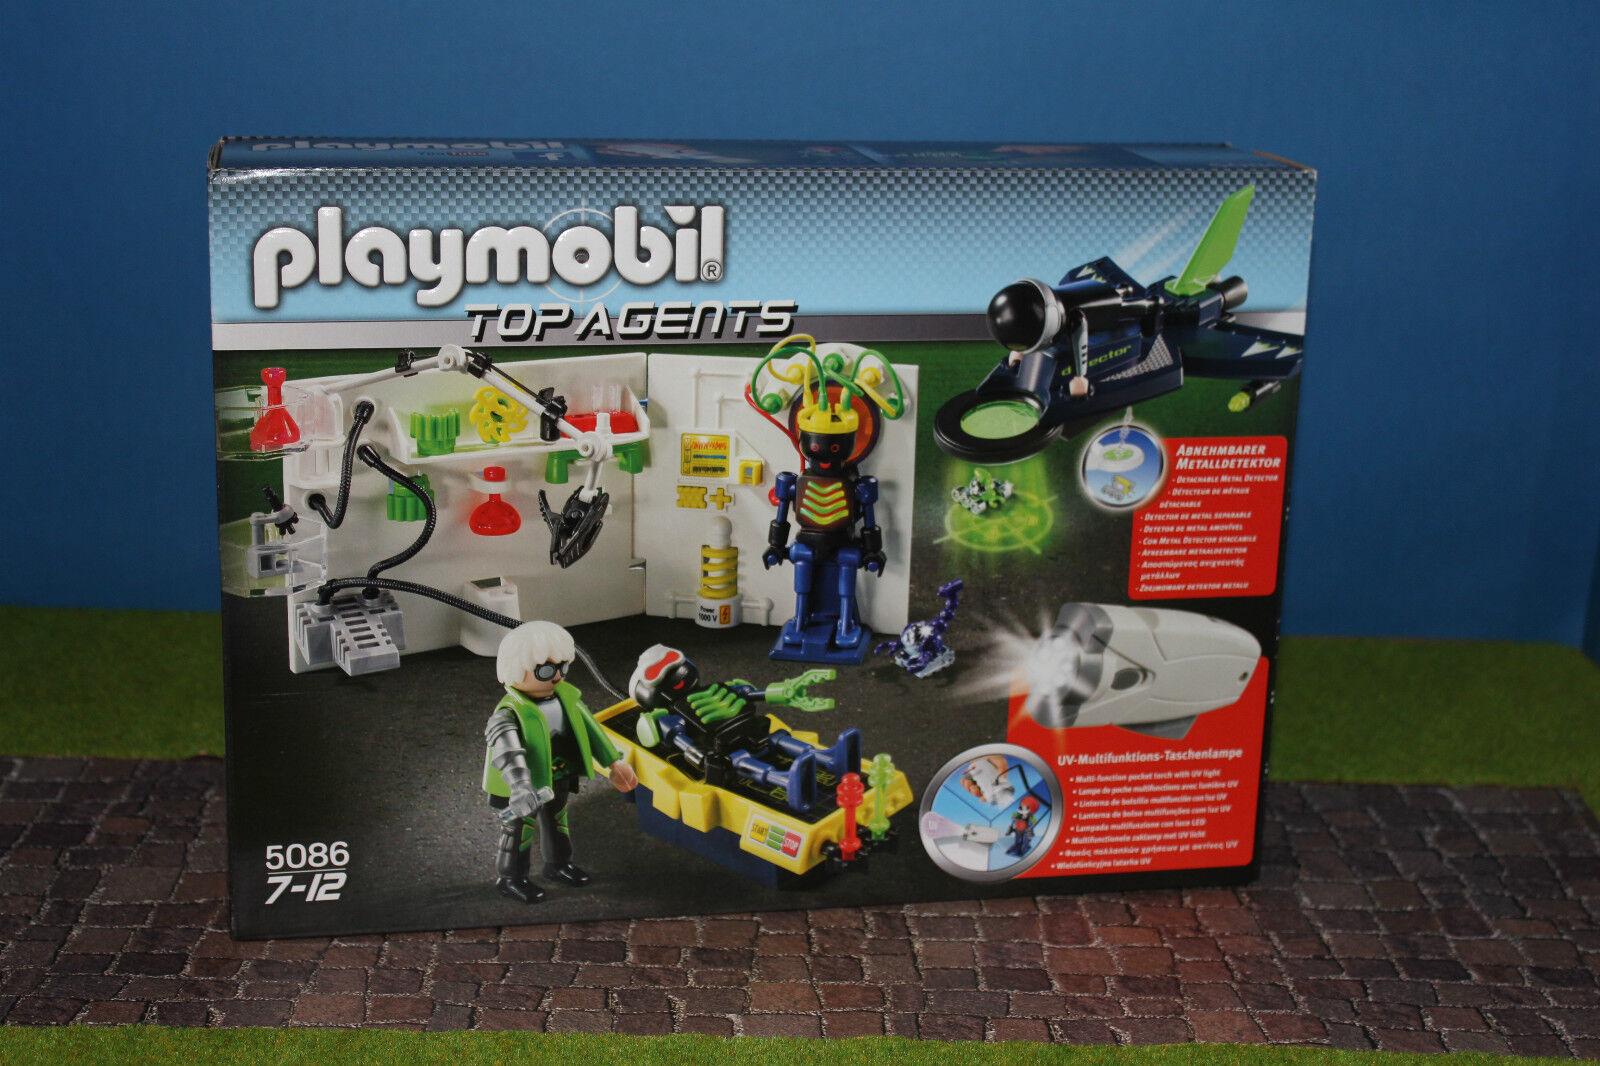 Playmobil 5086 Laboratorio Top Agents Nuevo   Embalaje Original Misb